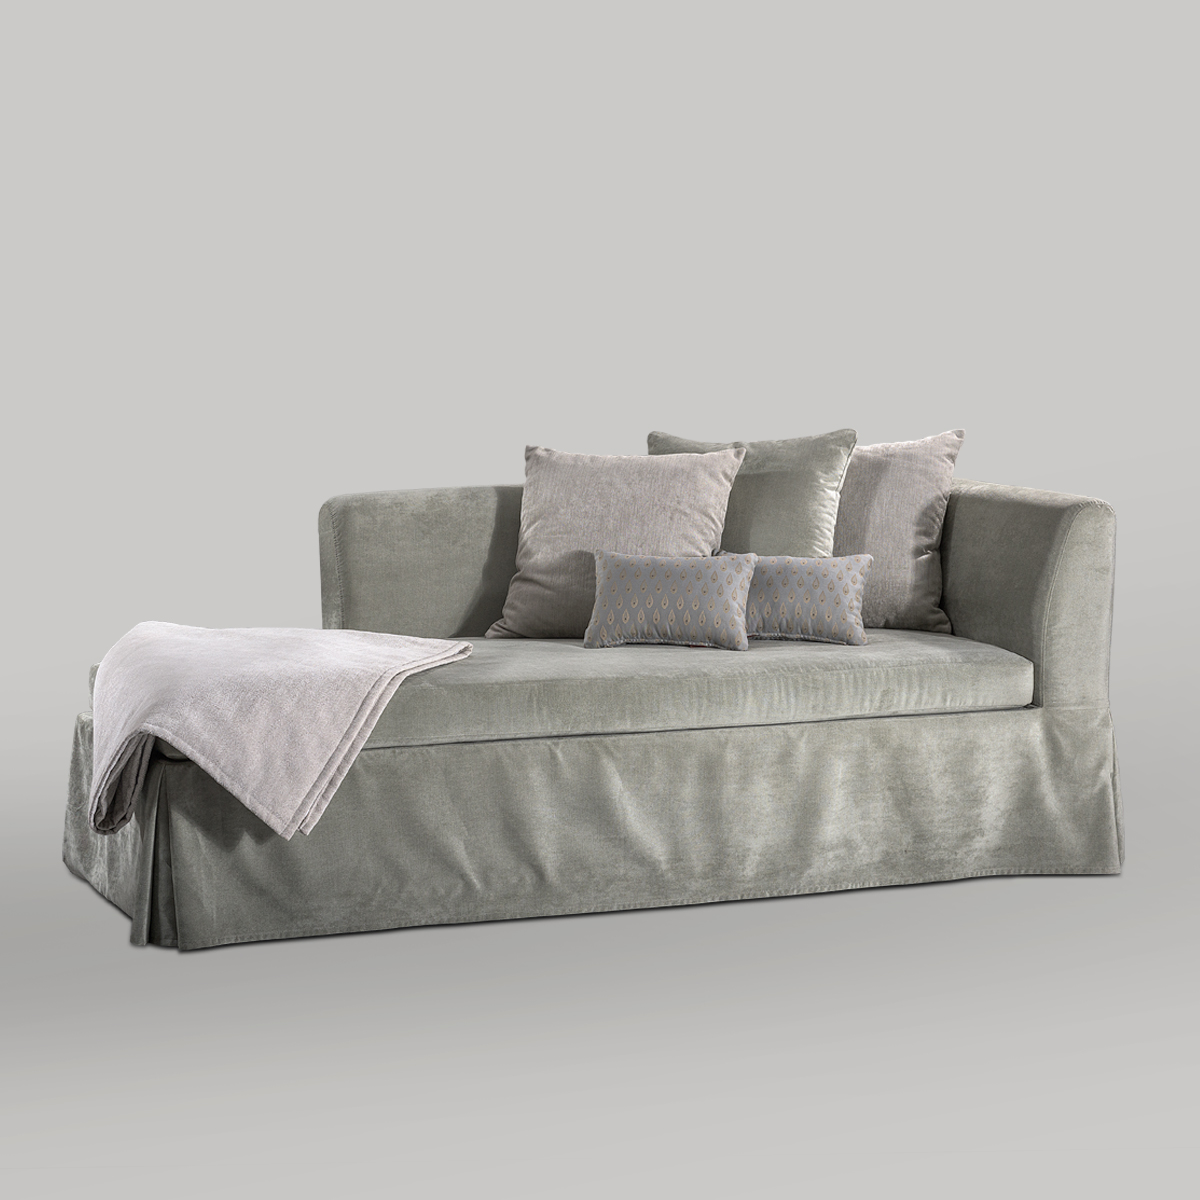 chaise longue Sofá cama Chaise Longue colunex chaise longue sofa bed 01